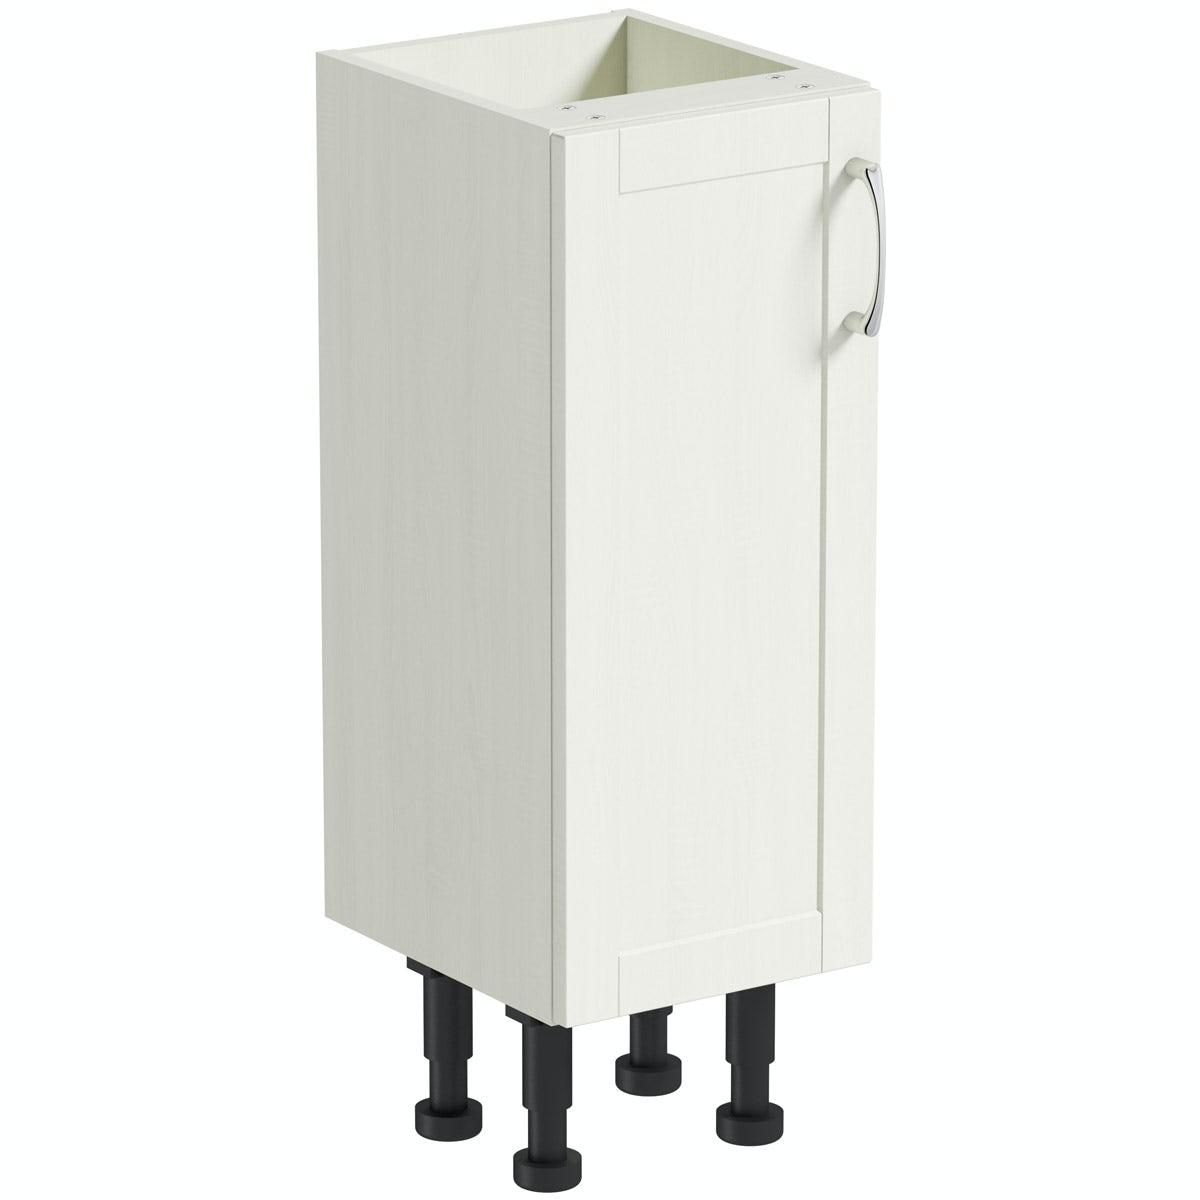 The Bath Co. Newbury white floor cabinet 300mm